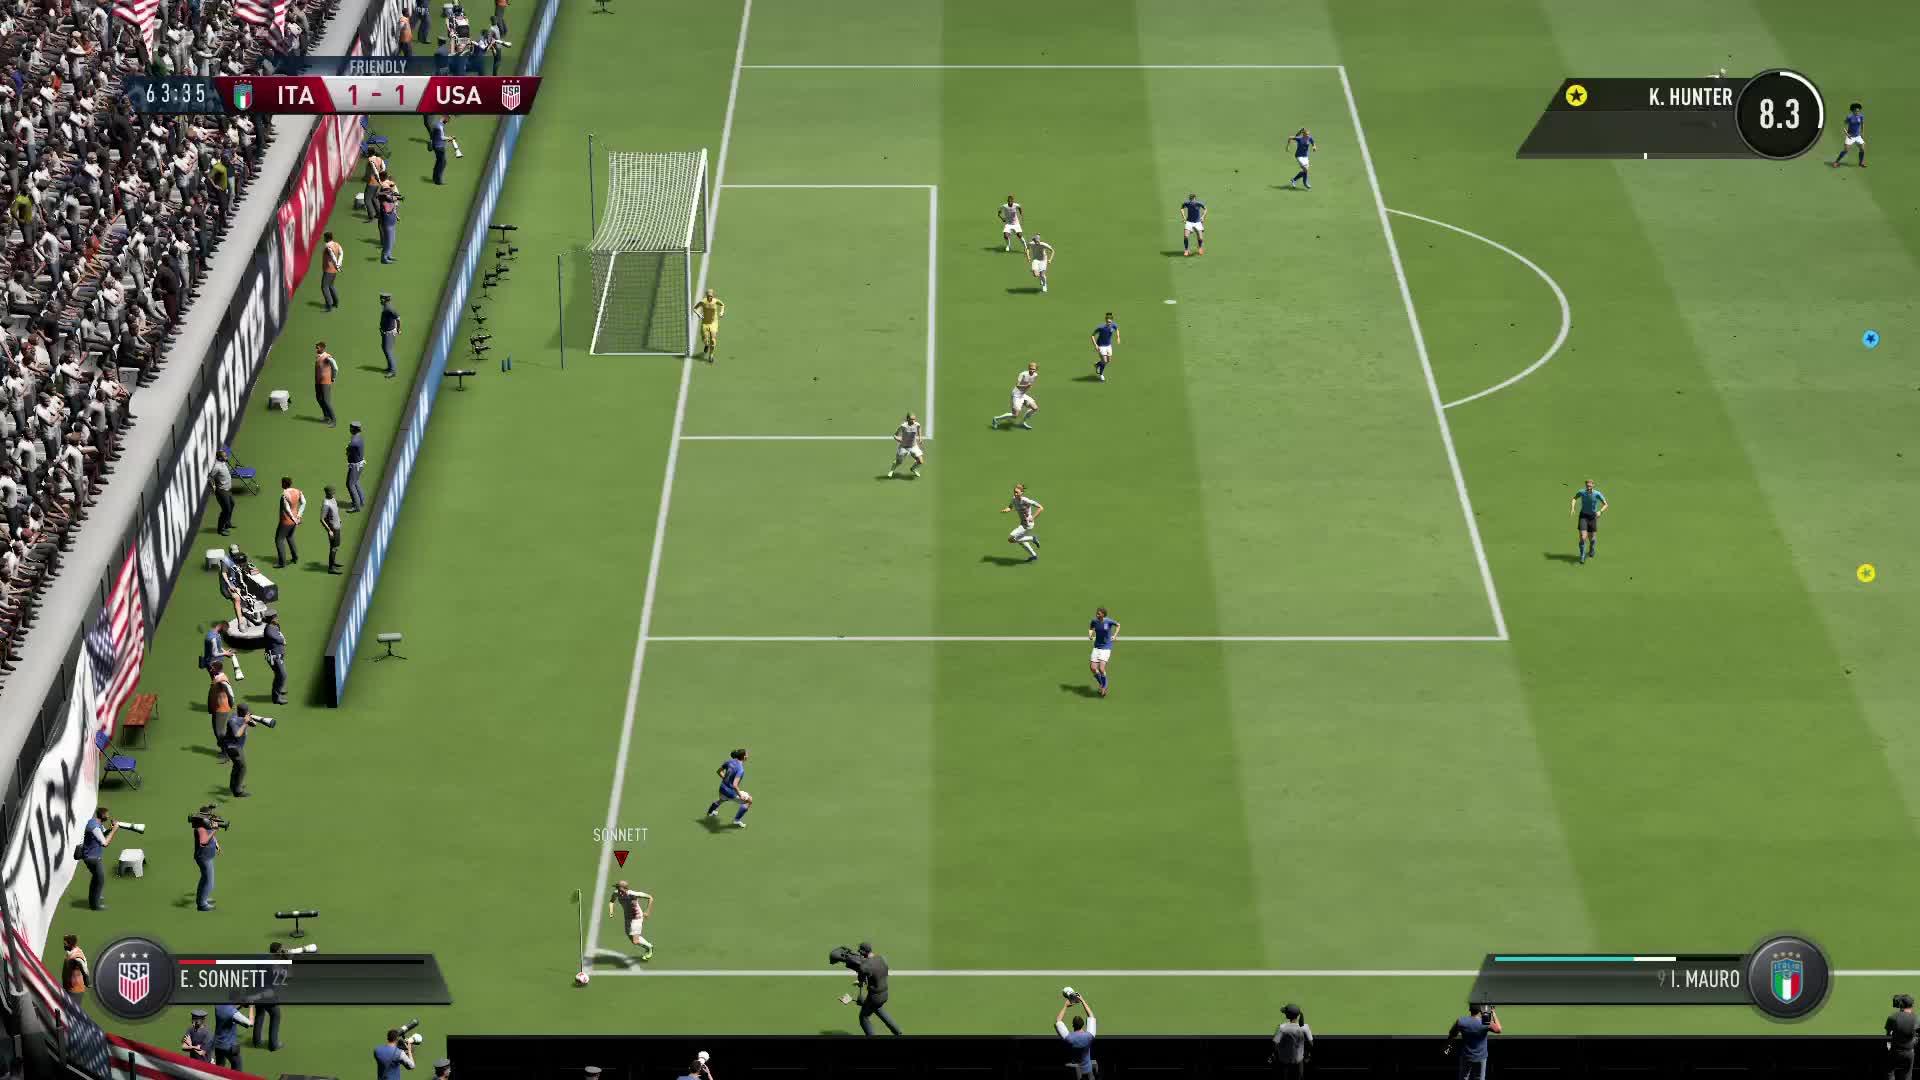 #PS4share, FIFA 19, Gaming, LBG1214, PlayStation 4, Sony Interactive Entertainment, FIFA 19_20190105104127 GIFs